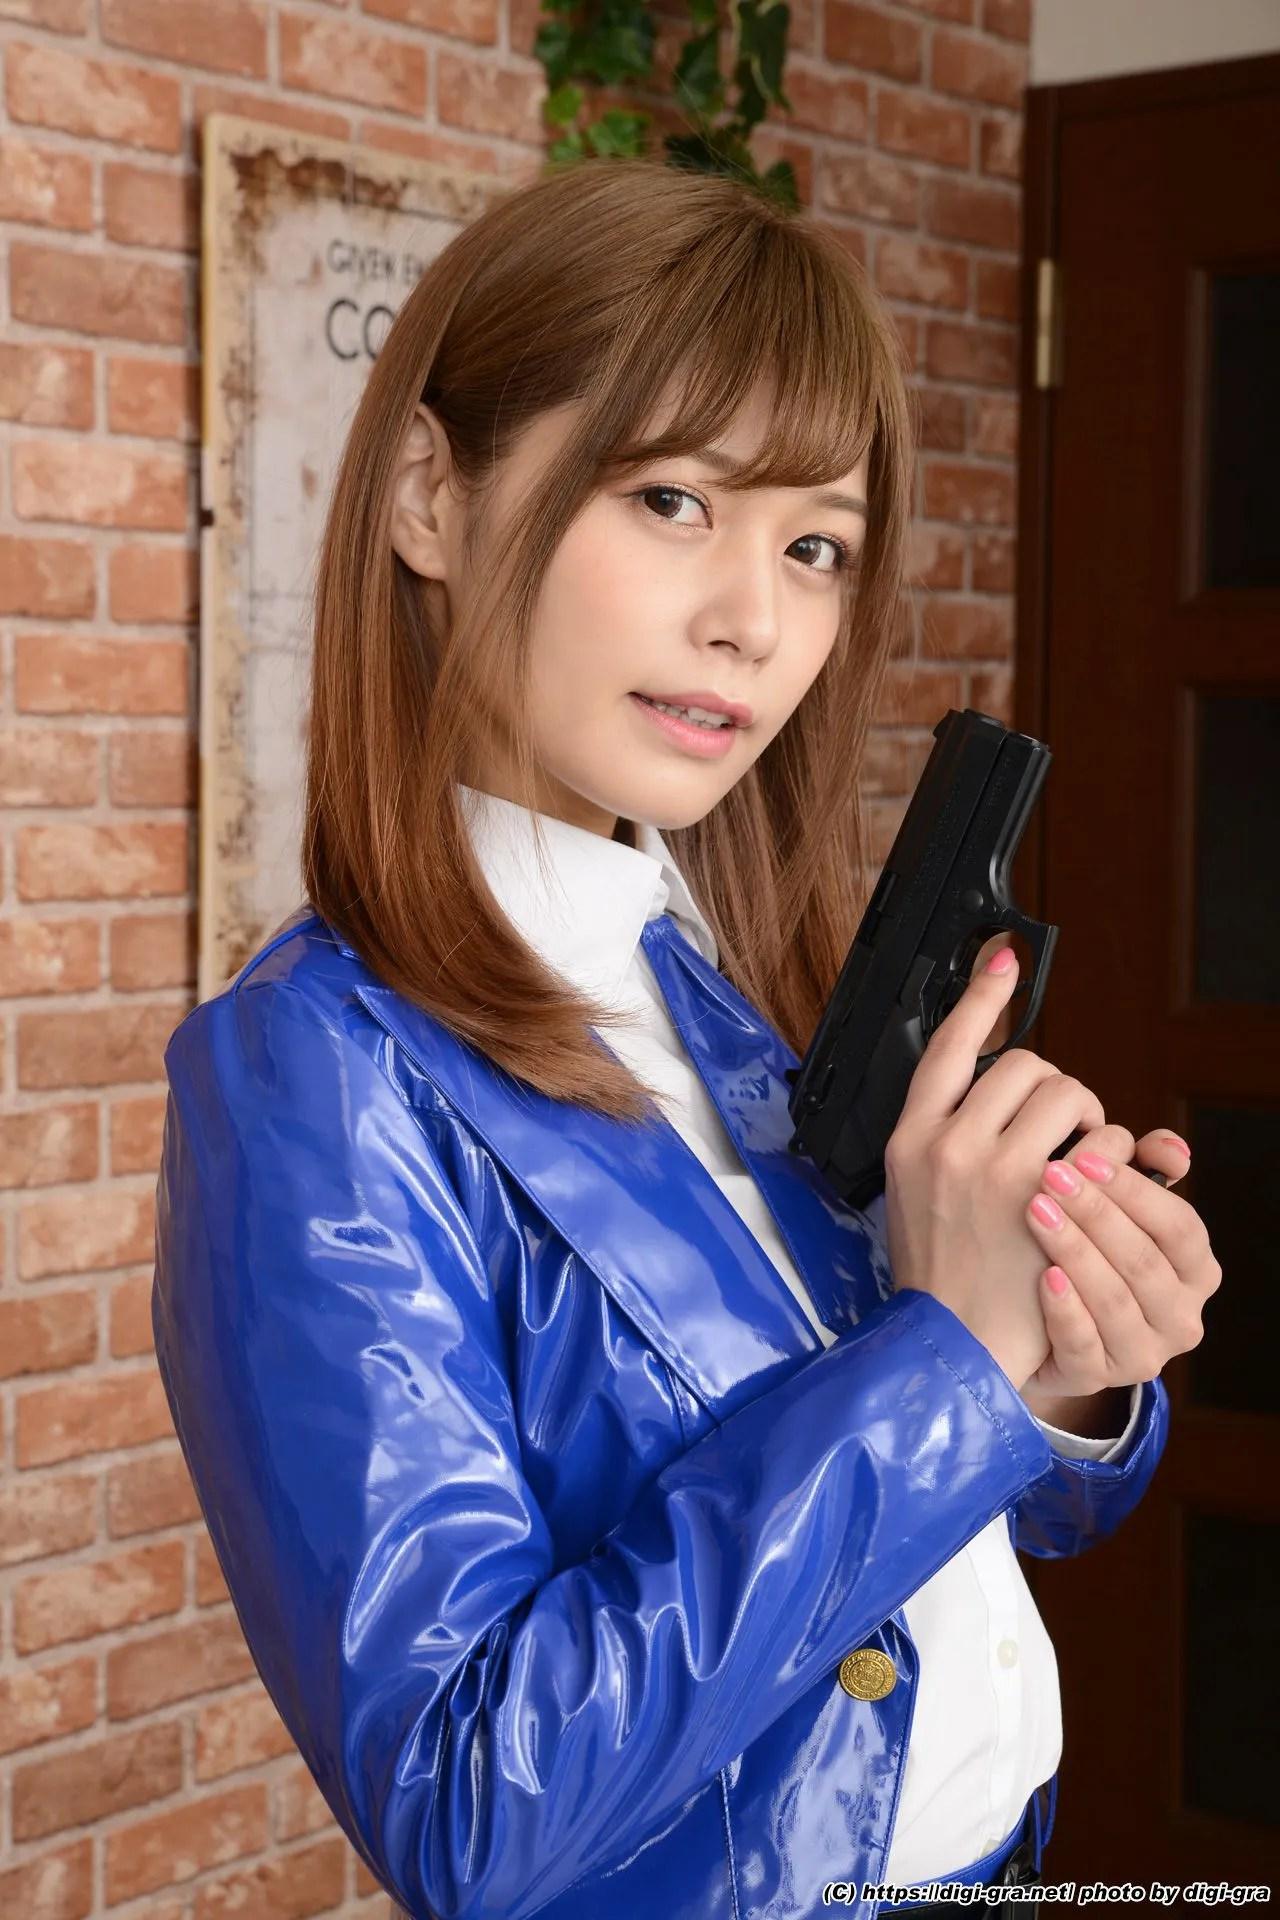 [Digi-Gra] Hikaru Konno 绀野ひかる Photoset 07 写真集[74P]插图(9)